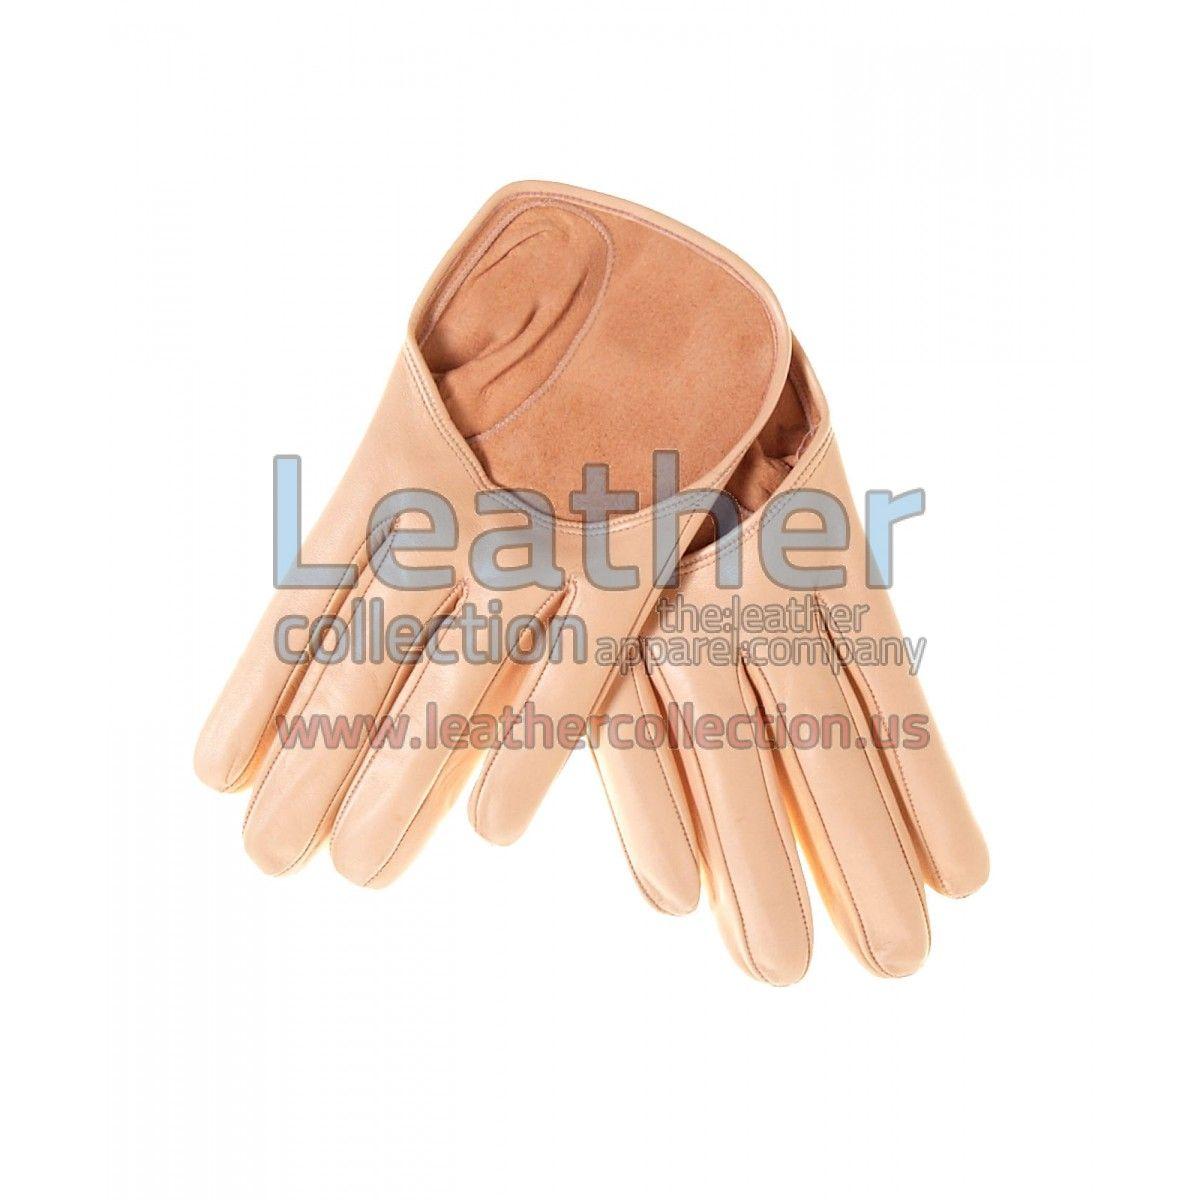 Beige Short Fashion Leather Gloves - https://www.leathercollection.us/en-we/beige-short-fashion-leather-gloves.html fashion leather gloves, short gloves #FashionLeatherGloves, #ShortGloves